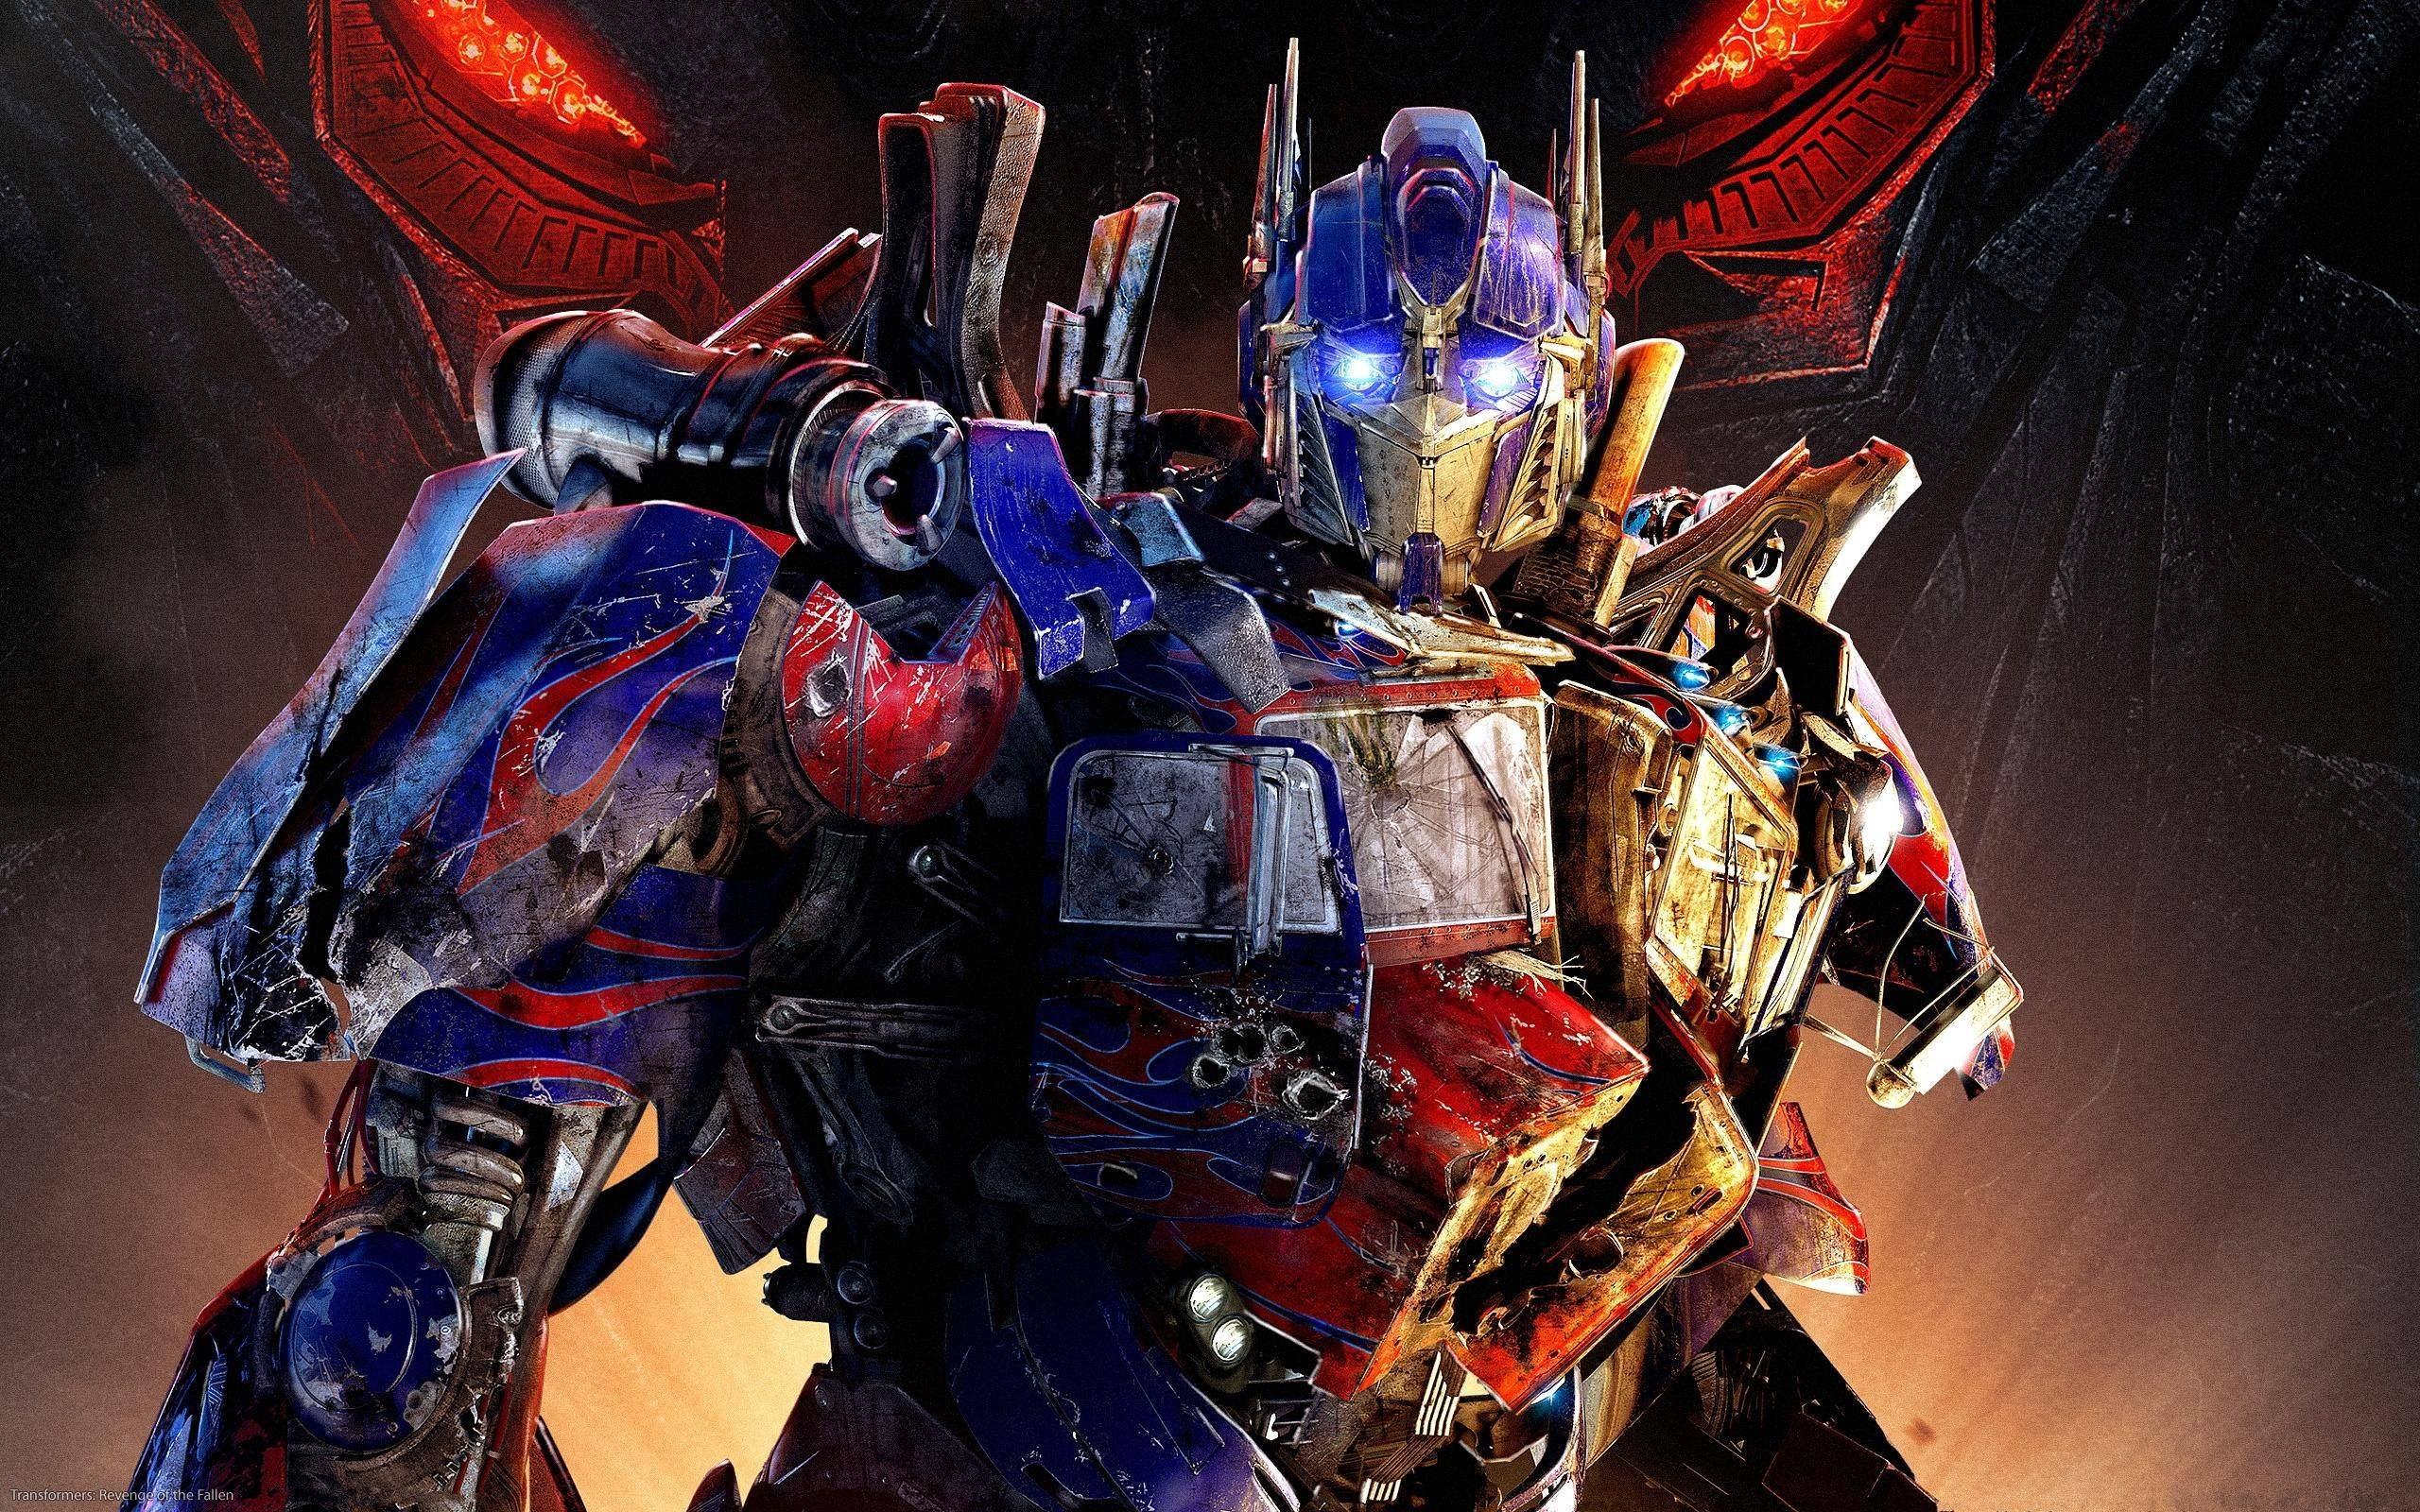 Transformers prime wallpapers hd wallpaper cave - Wallpapers transformers 4 ...